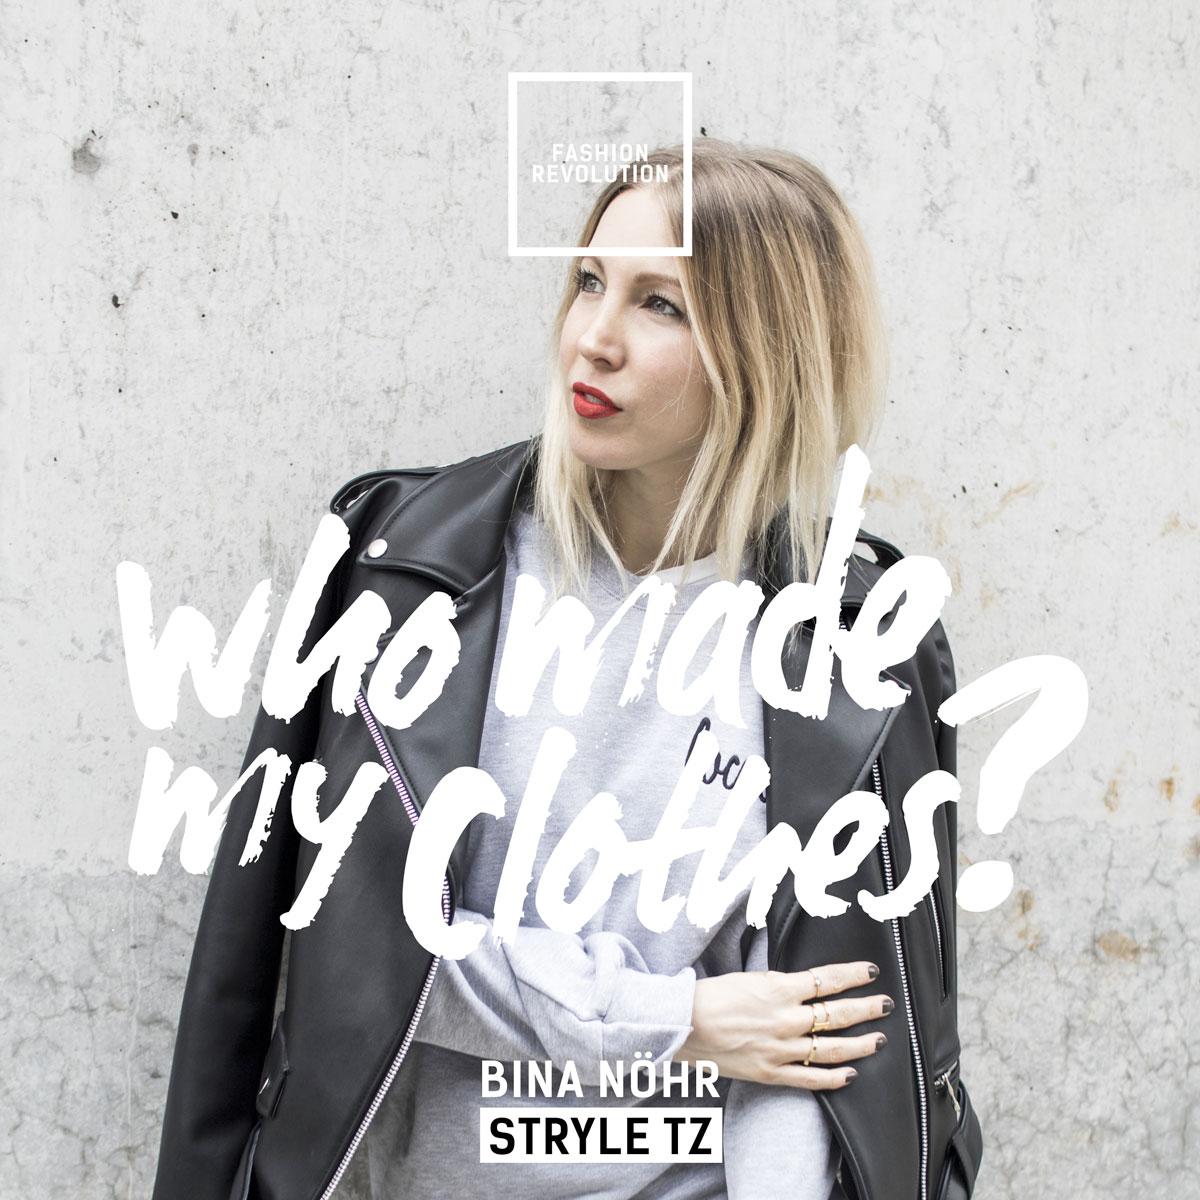 Fair Fashion, Fashion Revolution Day, Faire Mode, Labels, Shopping, Bina von StryleTz,